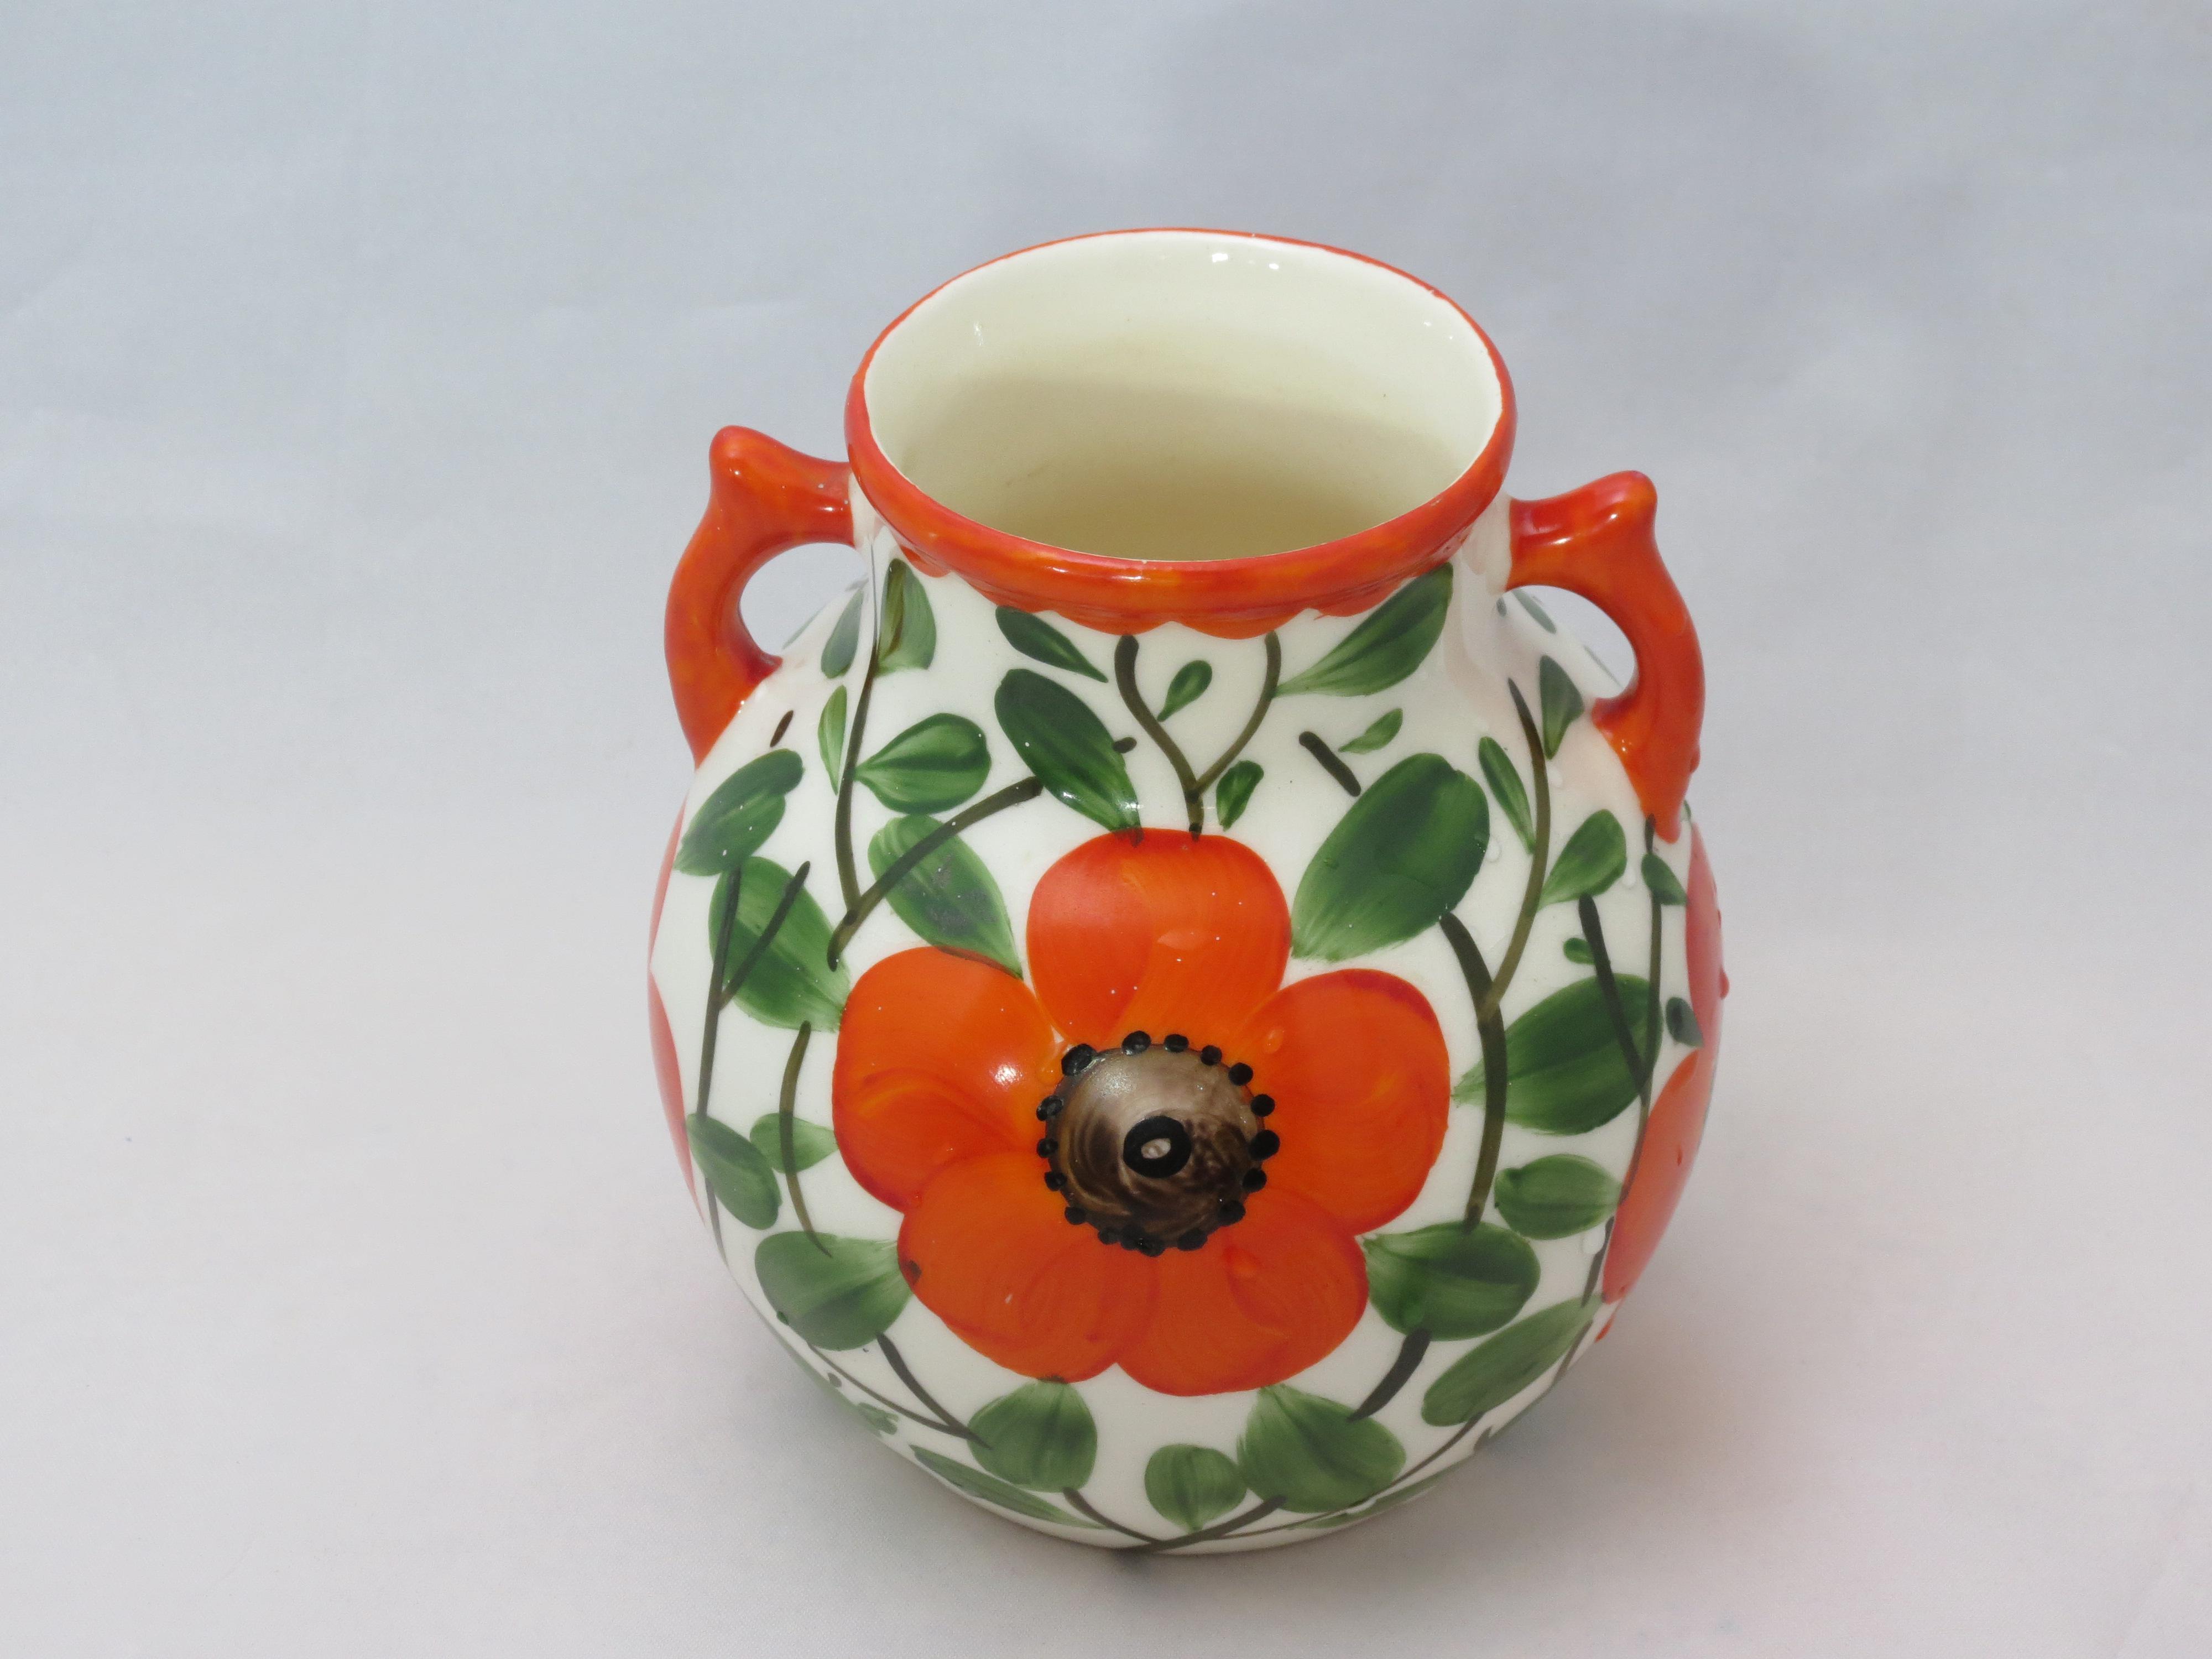 Gerold Porzellan 1960's Czech Registered Orange Poppy Vase